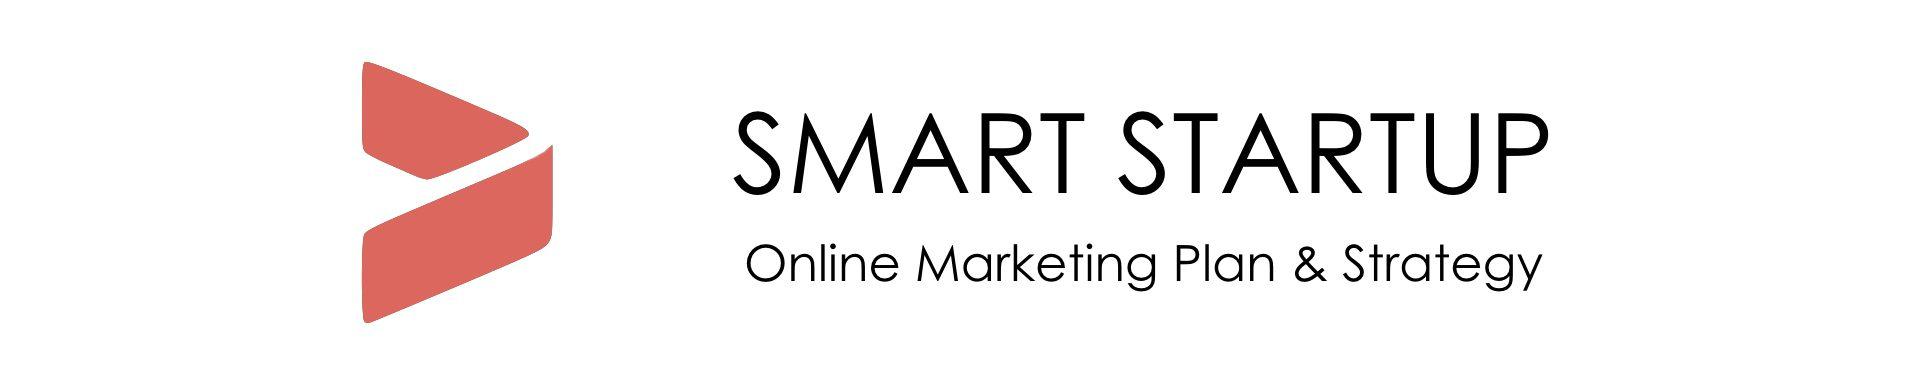 Smart Startup